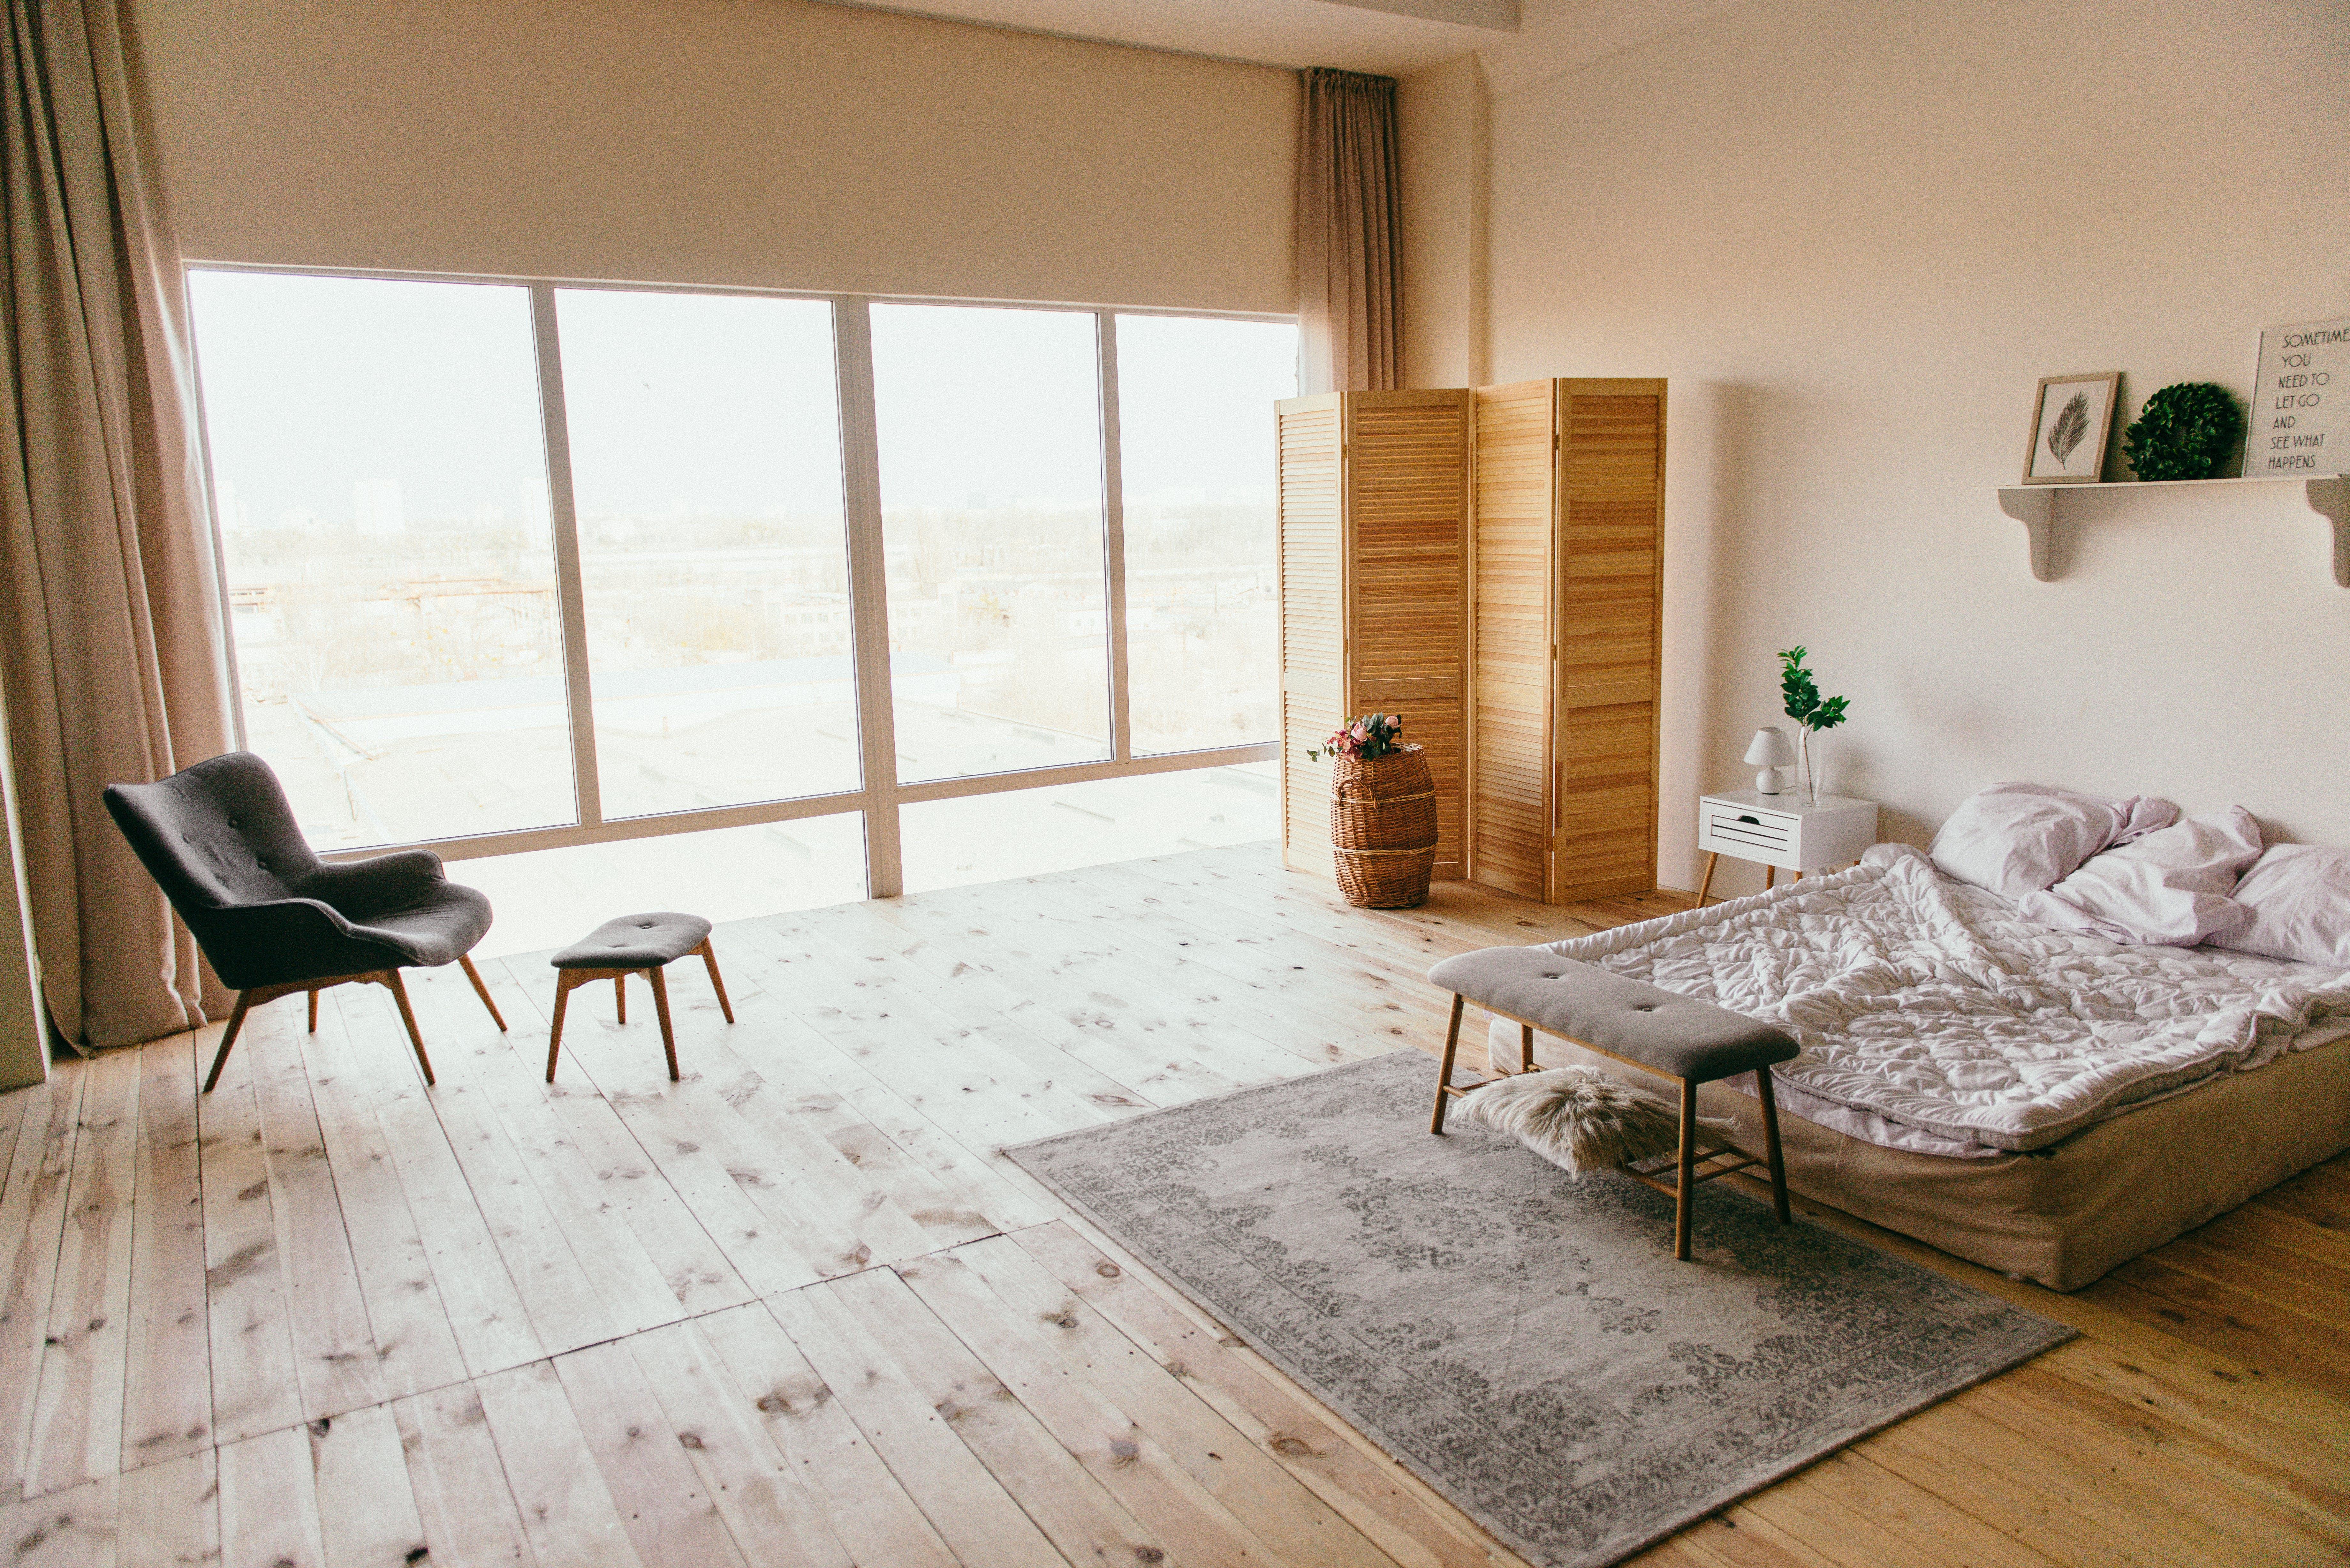 Fotos de stock gratuitas de adentro, alfombra, almohadas, arquitectura